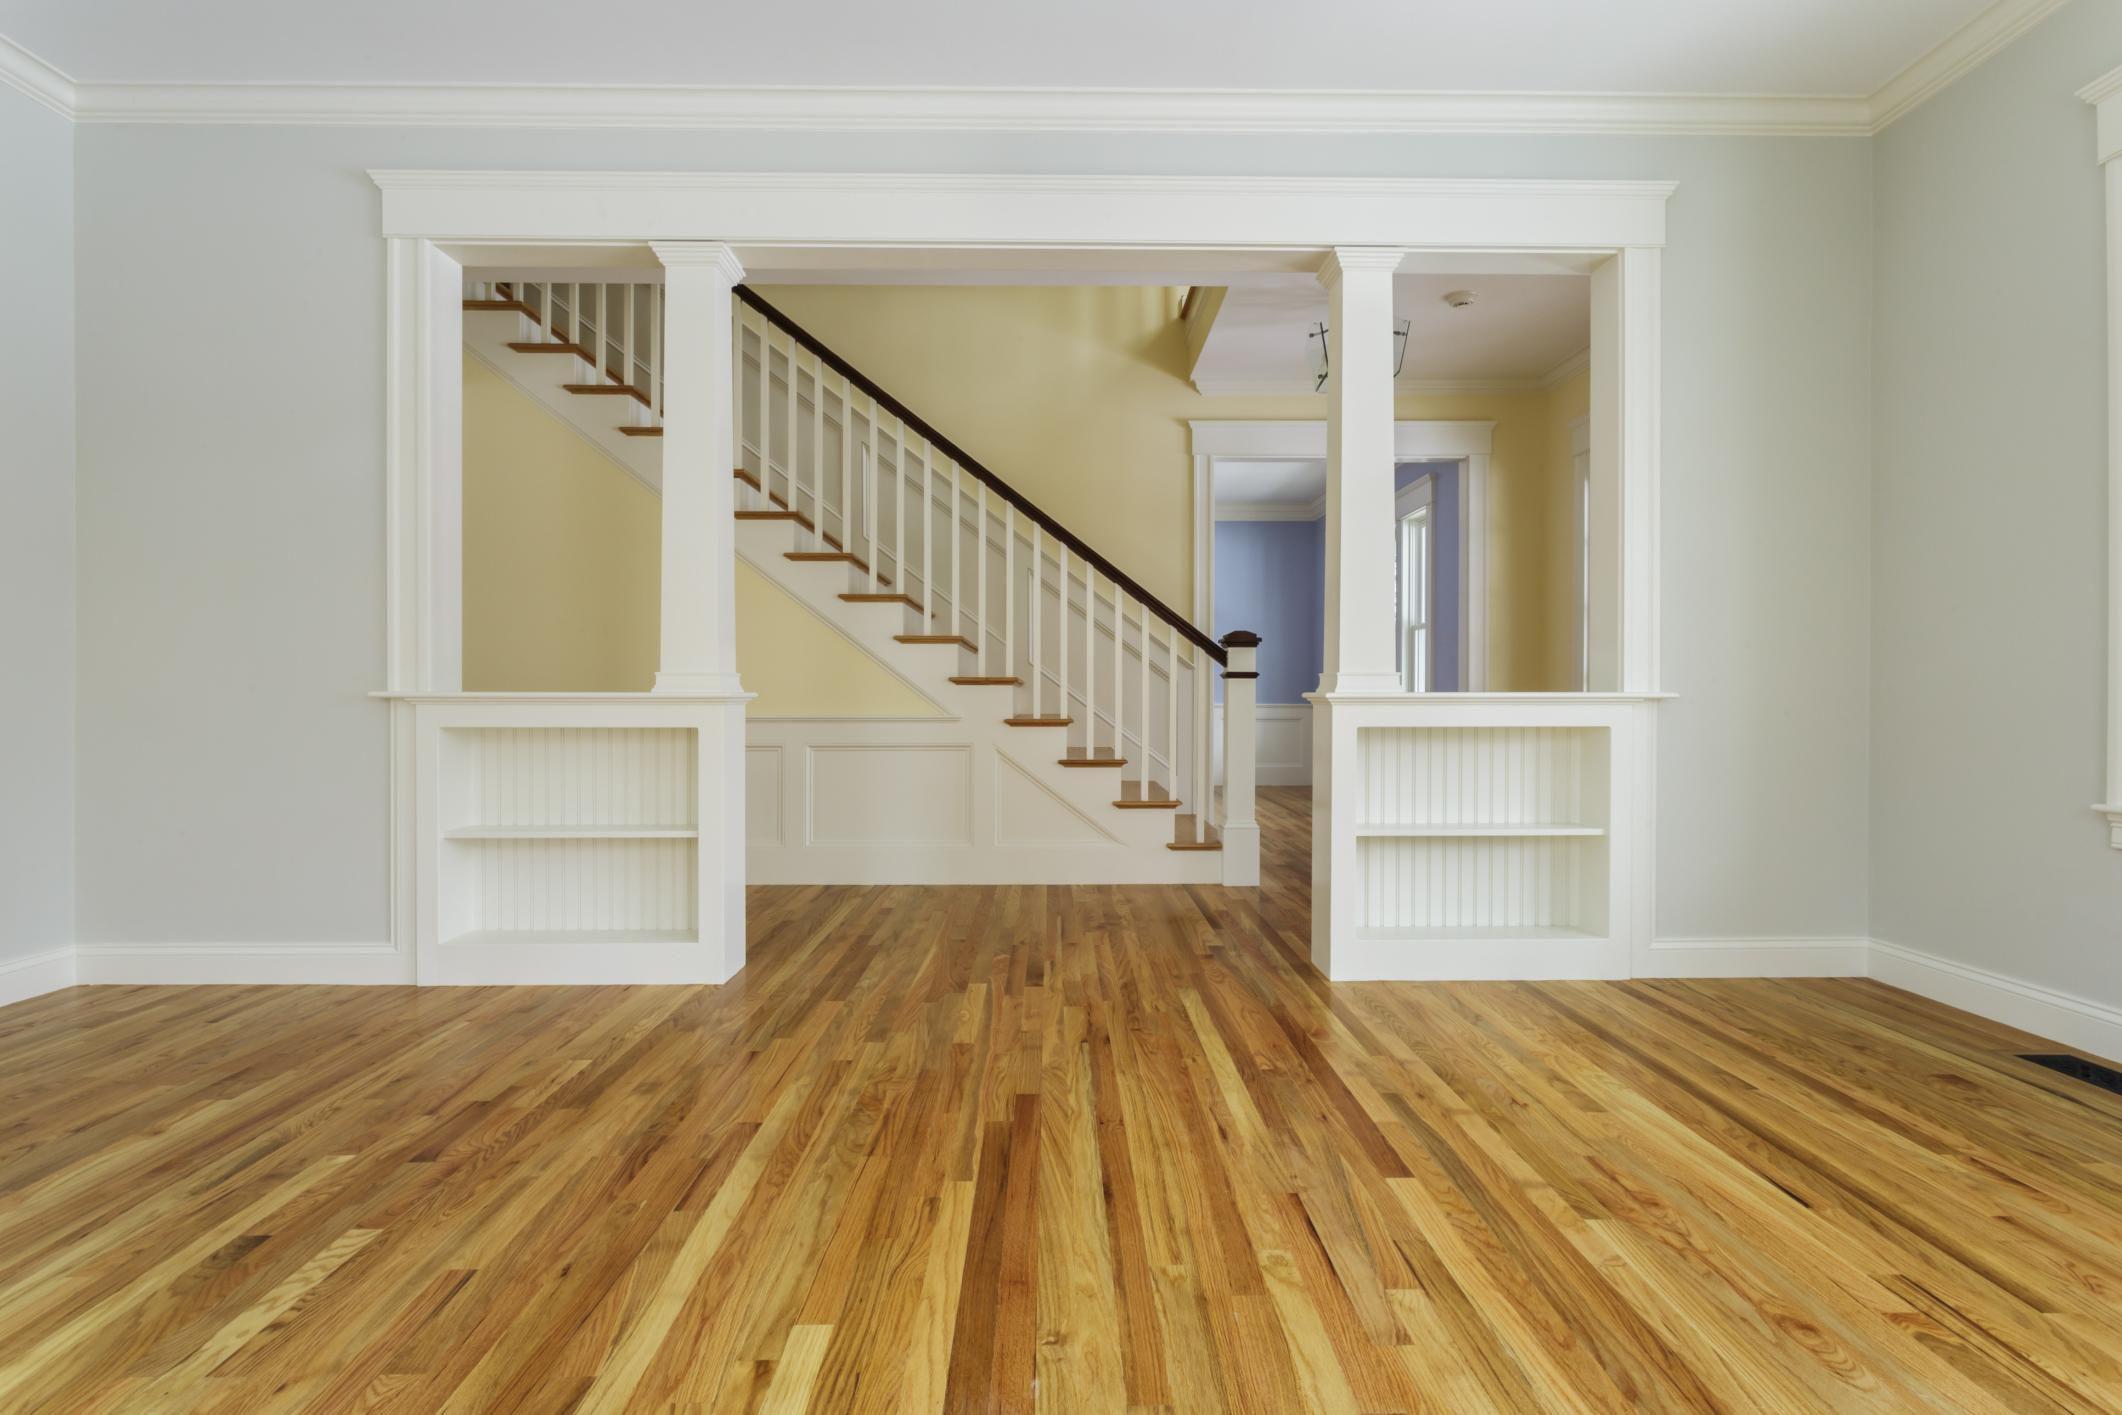 prefinished oak hardwood flooring of guide to solid hardwood floors for 168686571 56a49f213df78cf772834e24